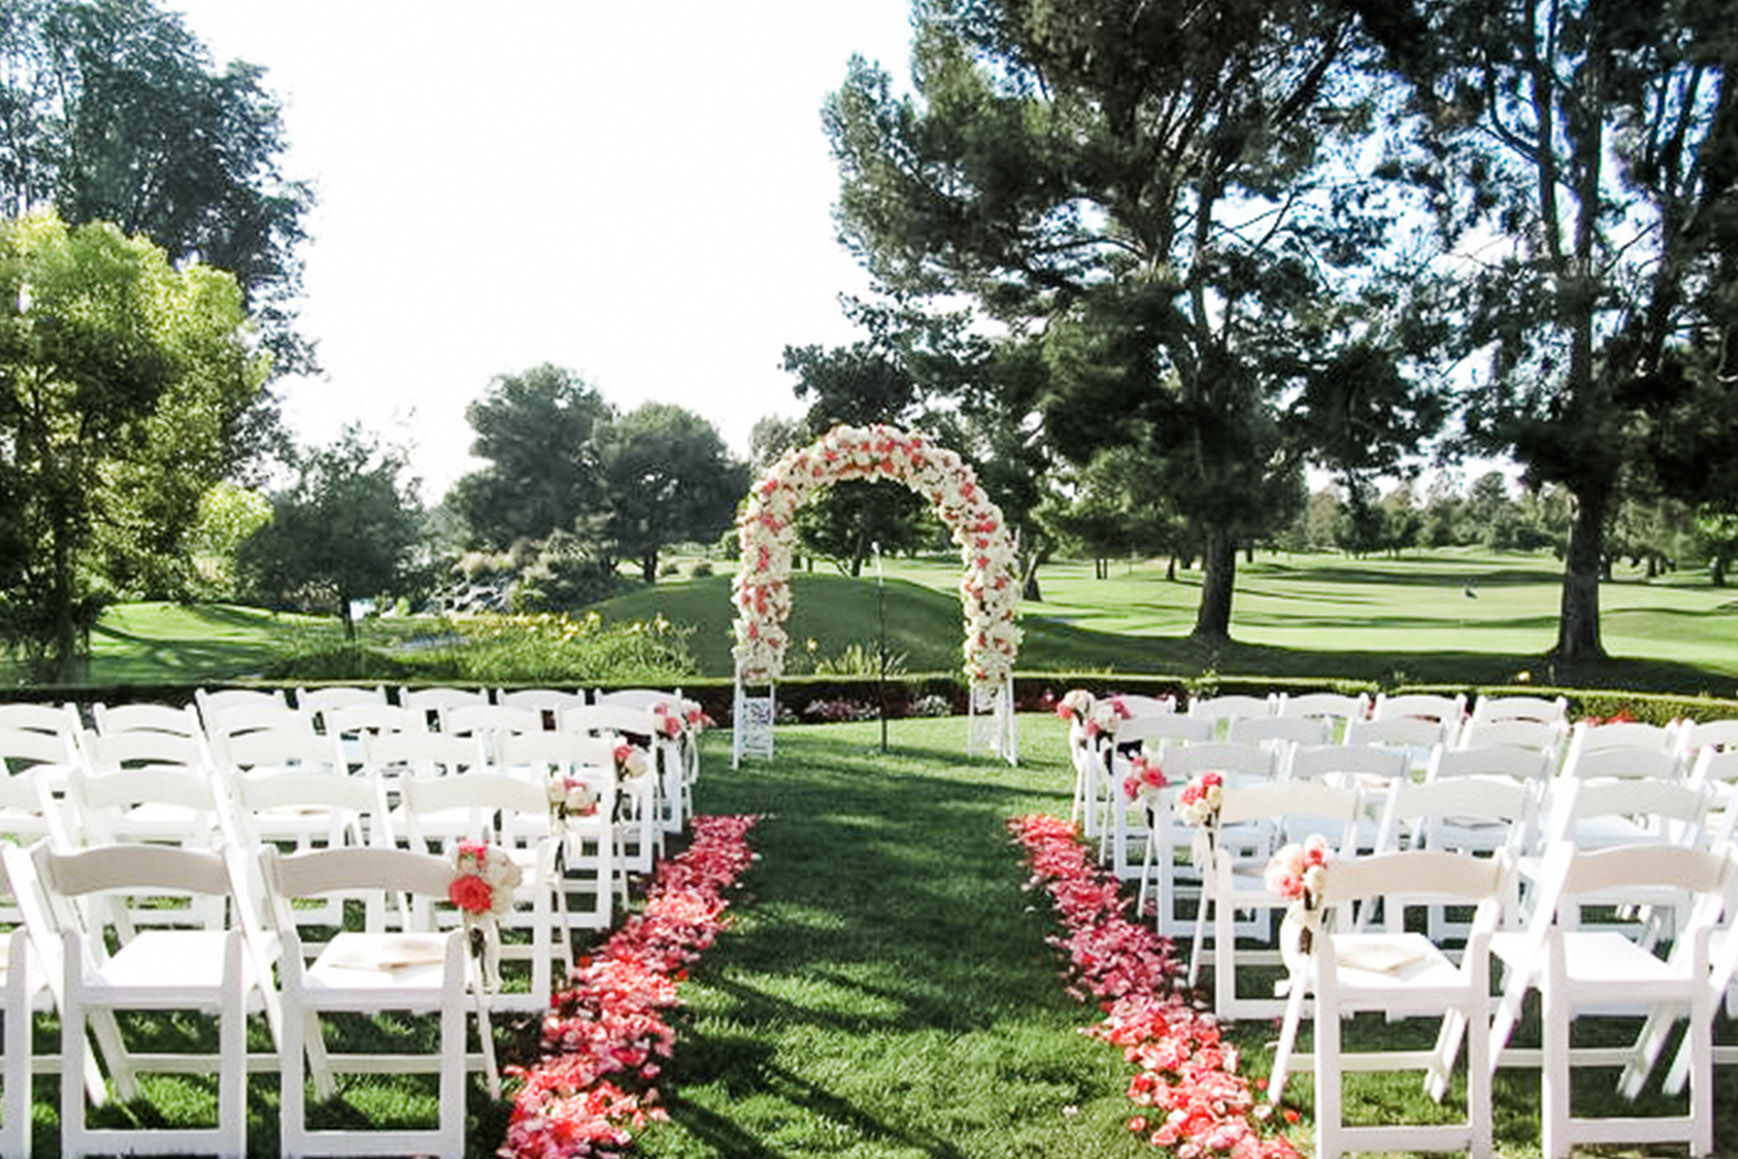 Outdoor Ceremony - Rio Hondo - Downey, California - Los Angeles County - Wedgewood Weddings